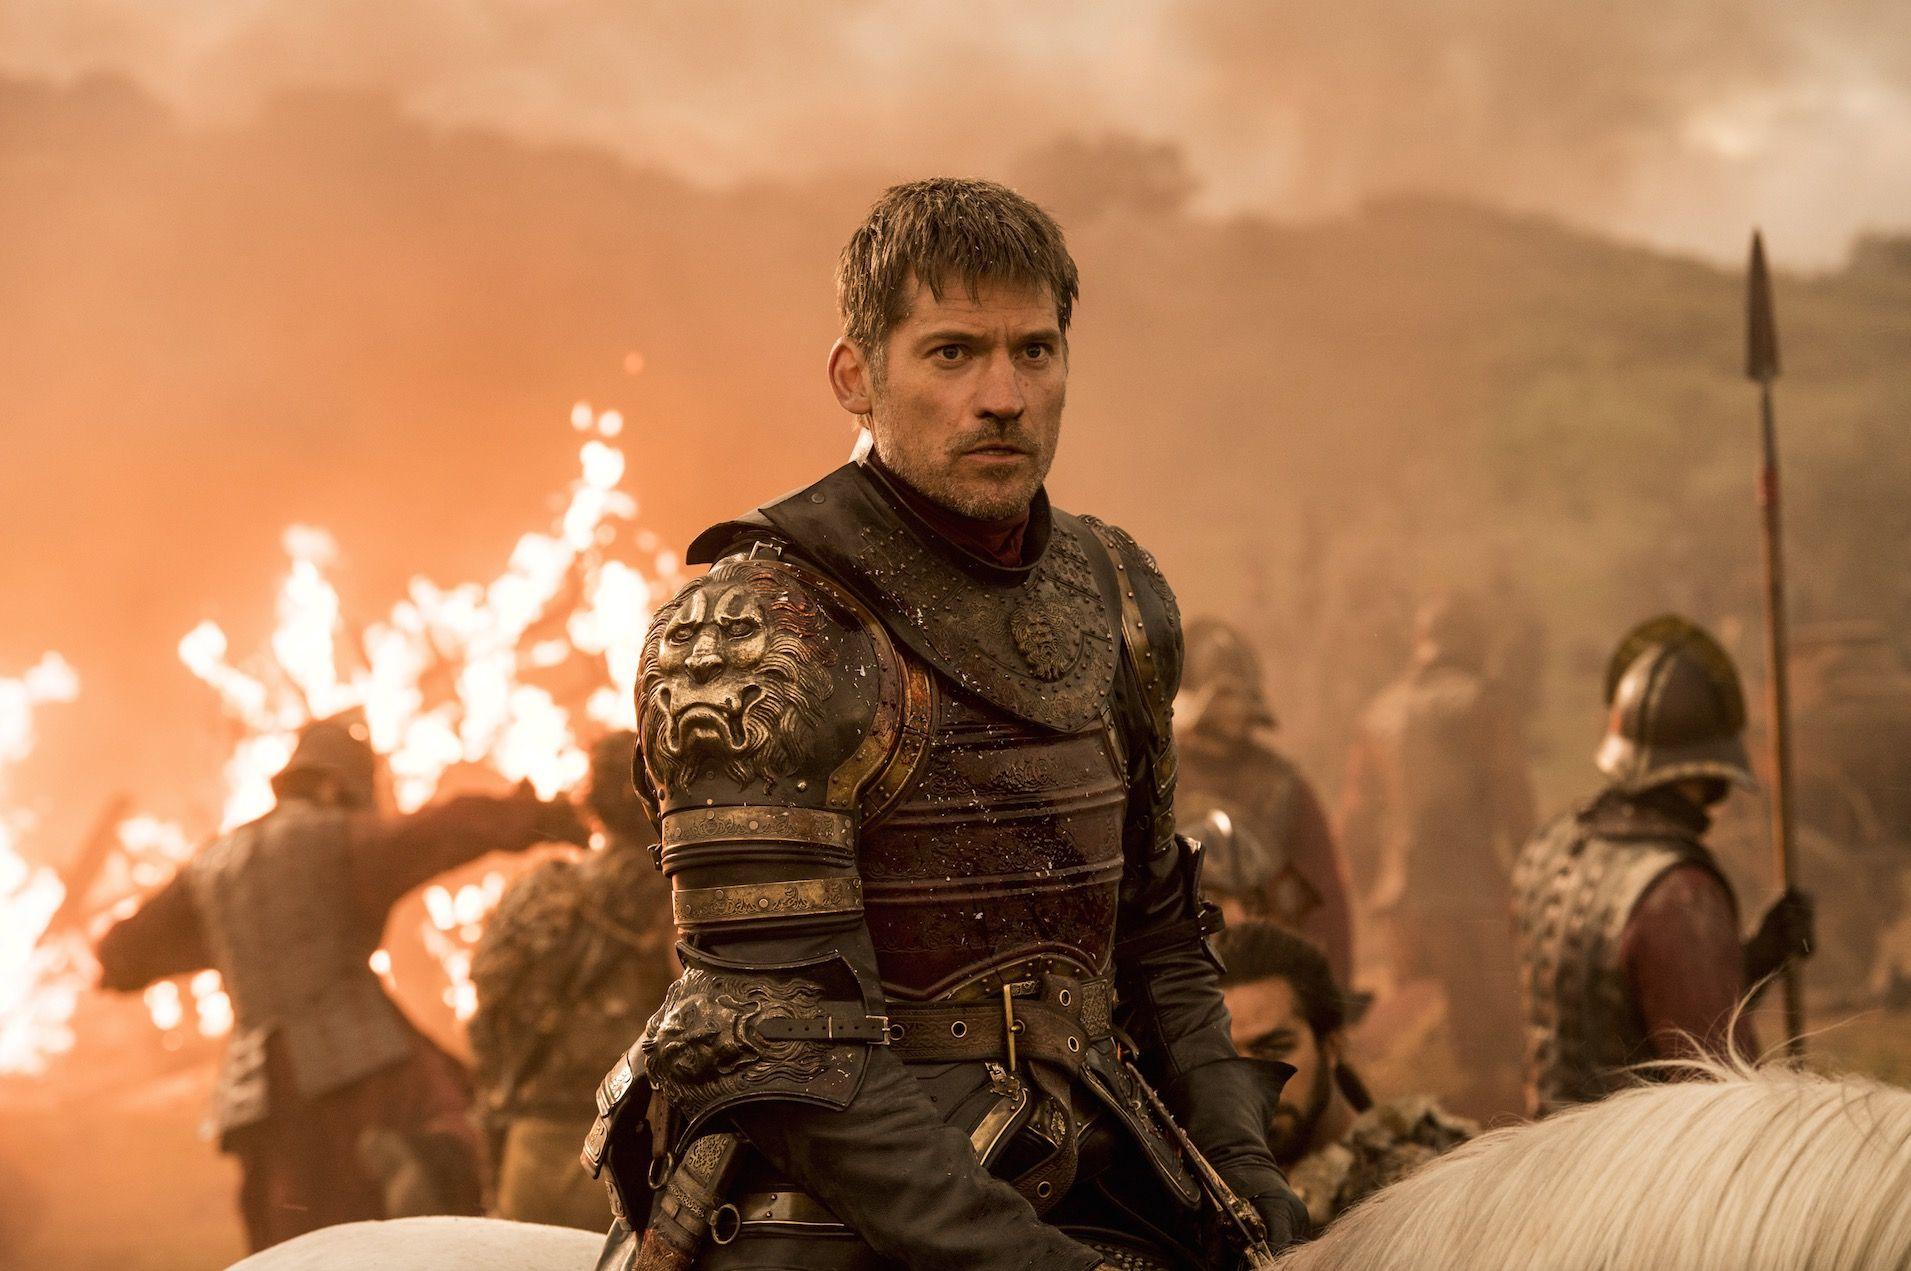 Game of Thrones season 8 spoilers – What's Jaime Lannister